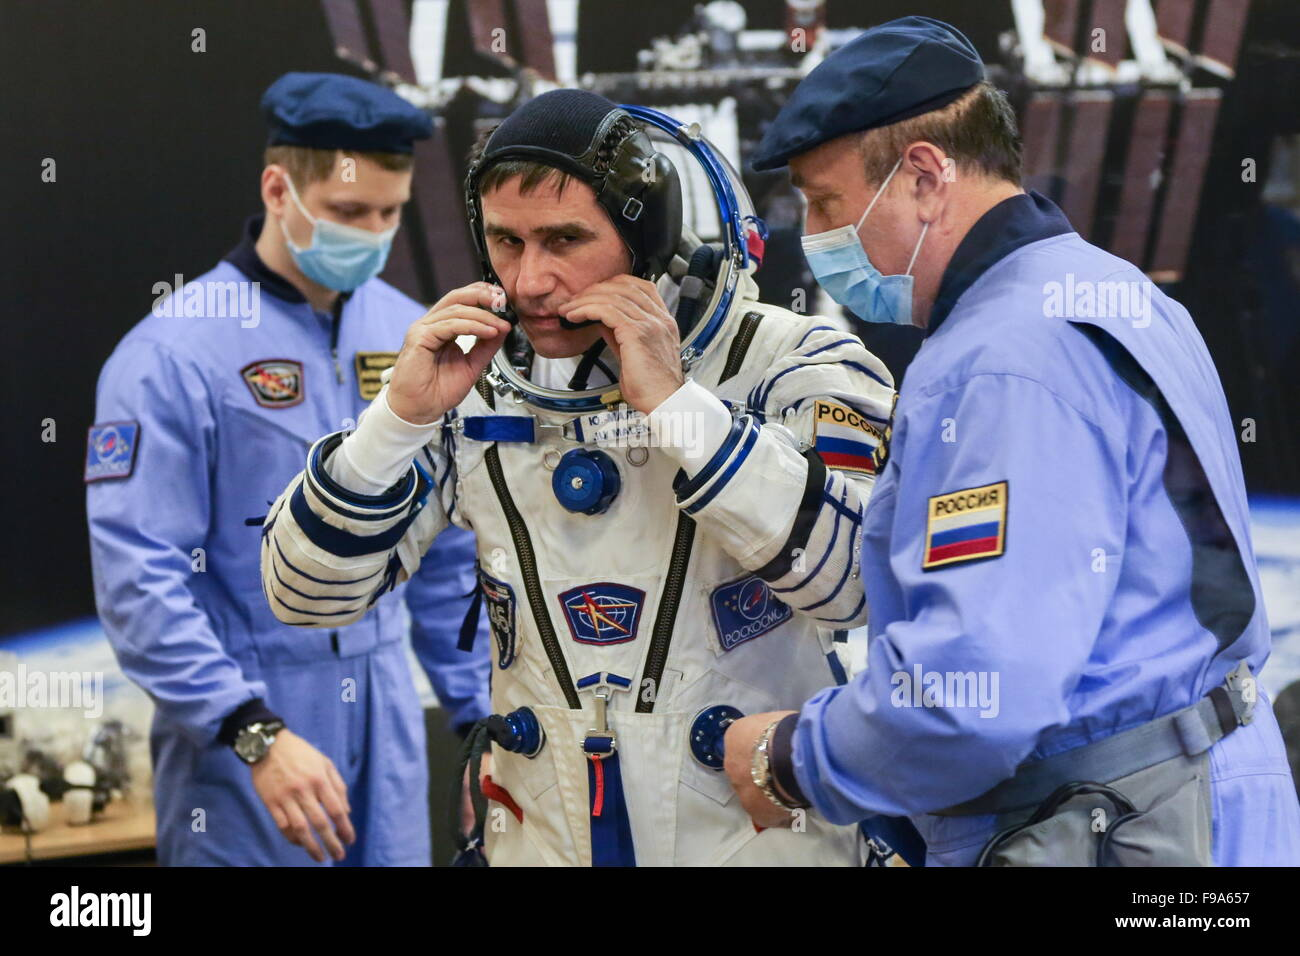 Baikonur, Kazakhstan. 15th Dec, 2015. ISS Expedition 46/47 crew member, Roscosmos cosmonaut Yuri Malenchenko (C) - Stock Image